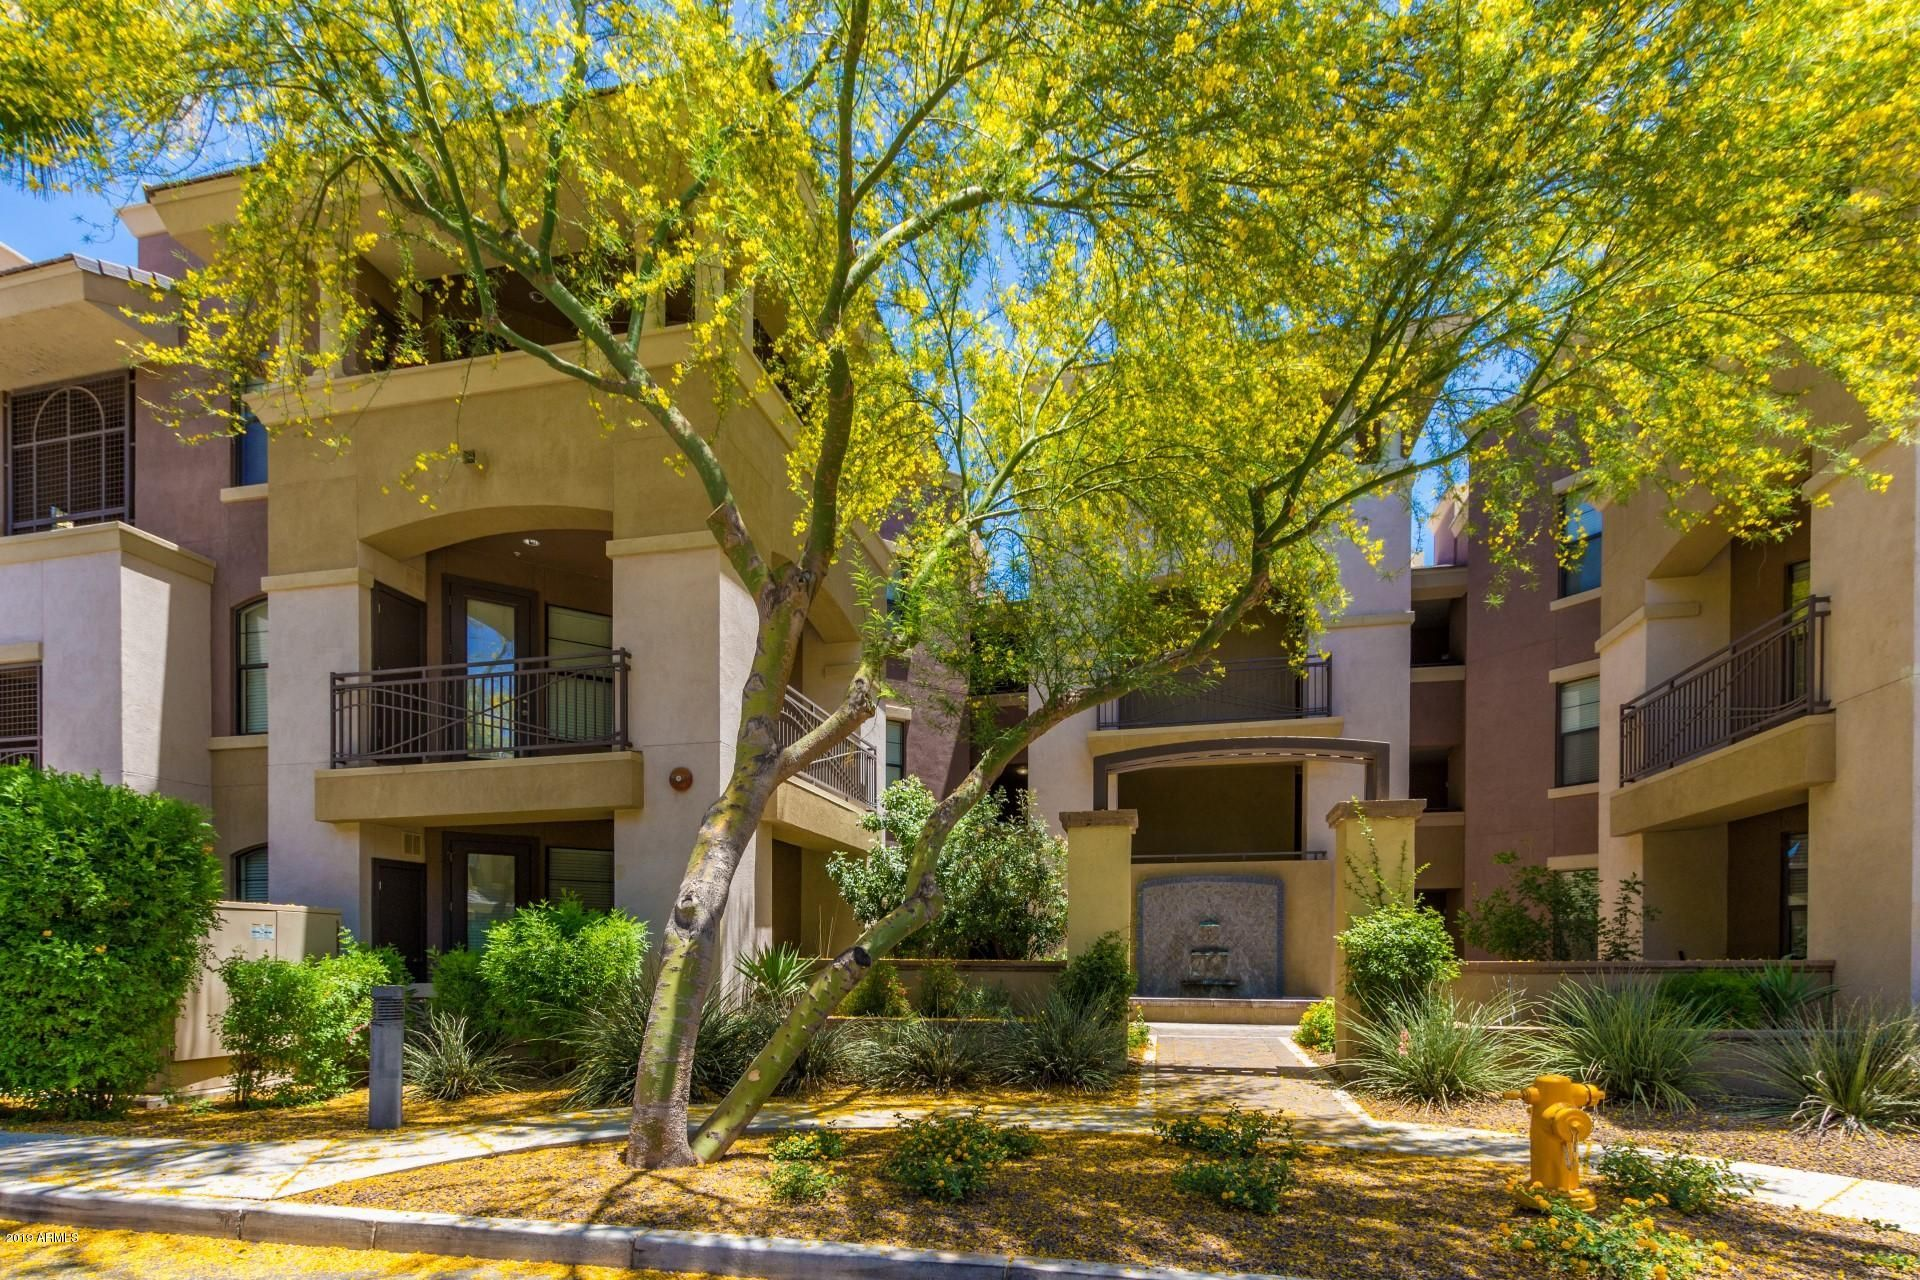 7601 E INDIAN BEND Road 3035 Scottsdale AZ 85250